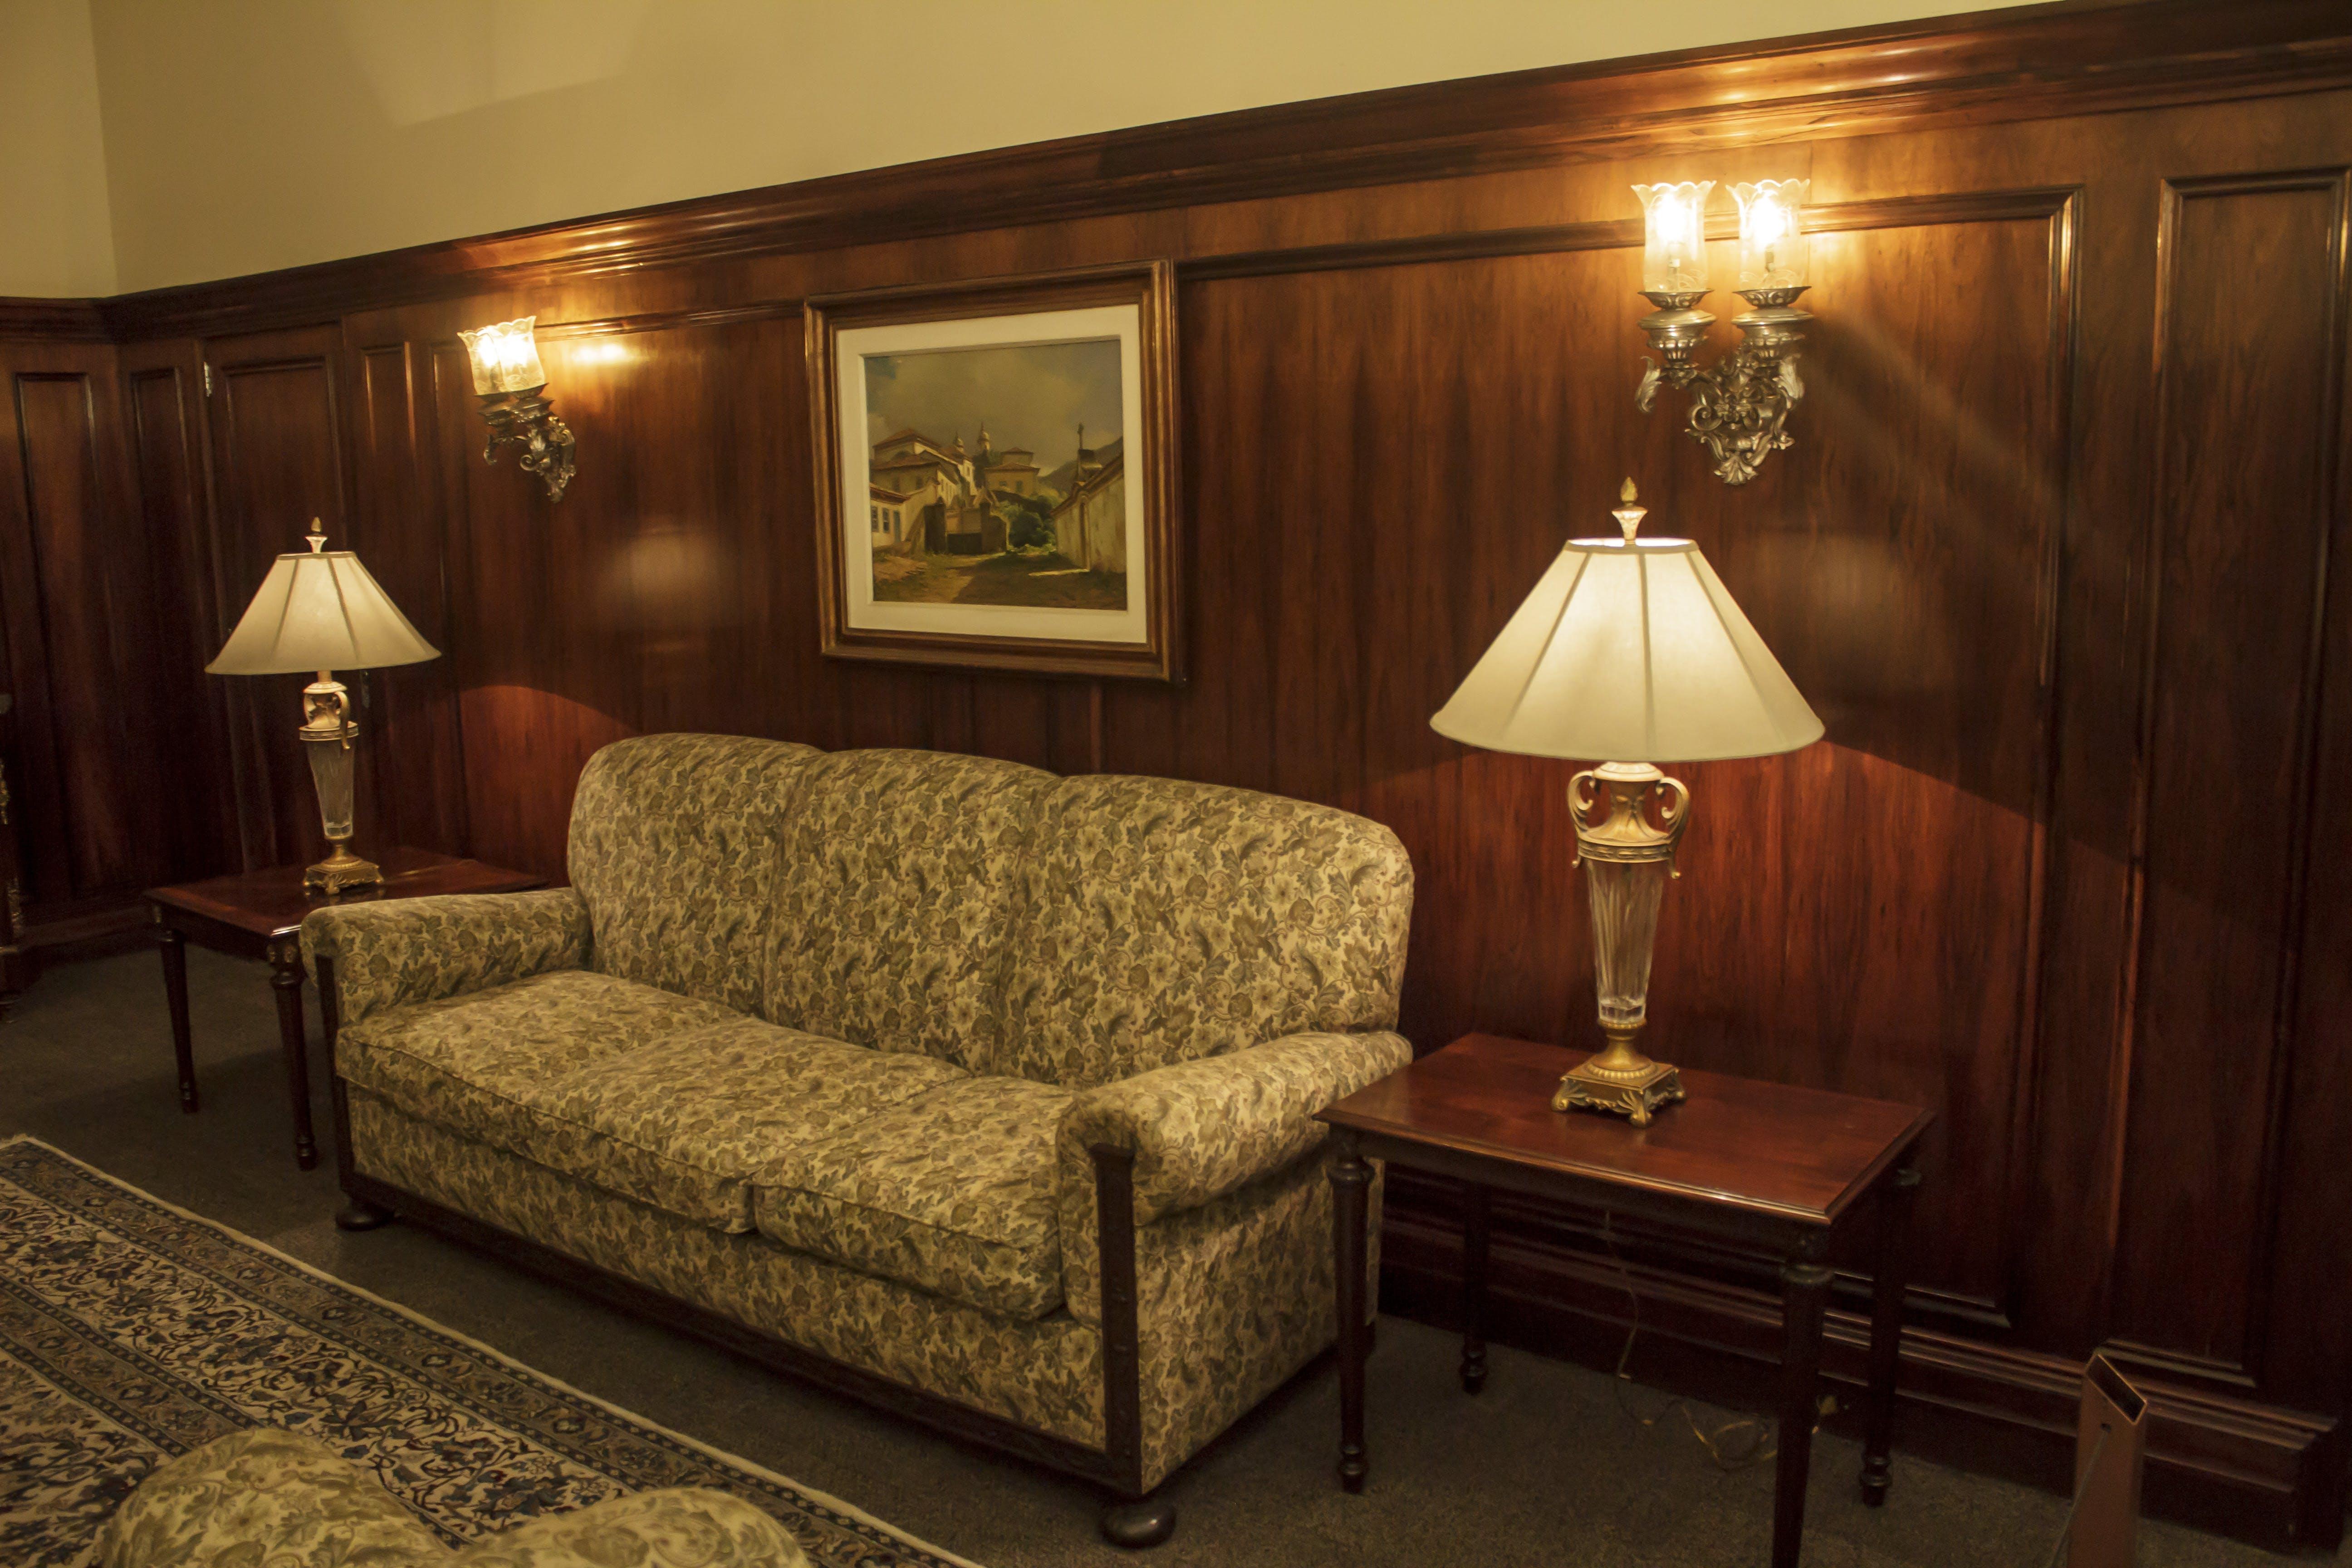 of bedside lamp, lampshade, old room, vintage